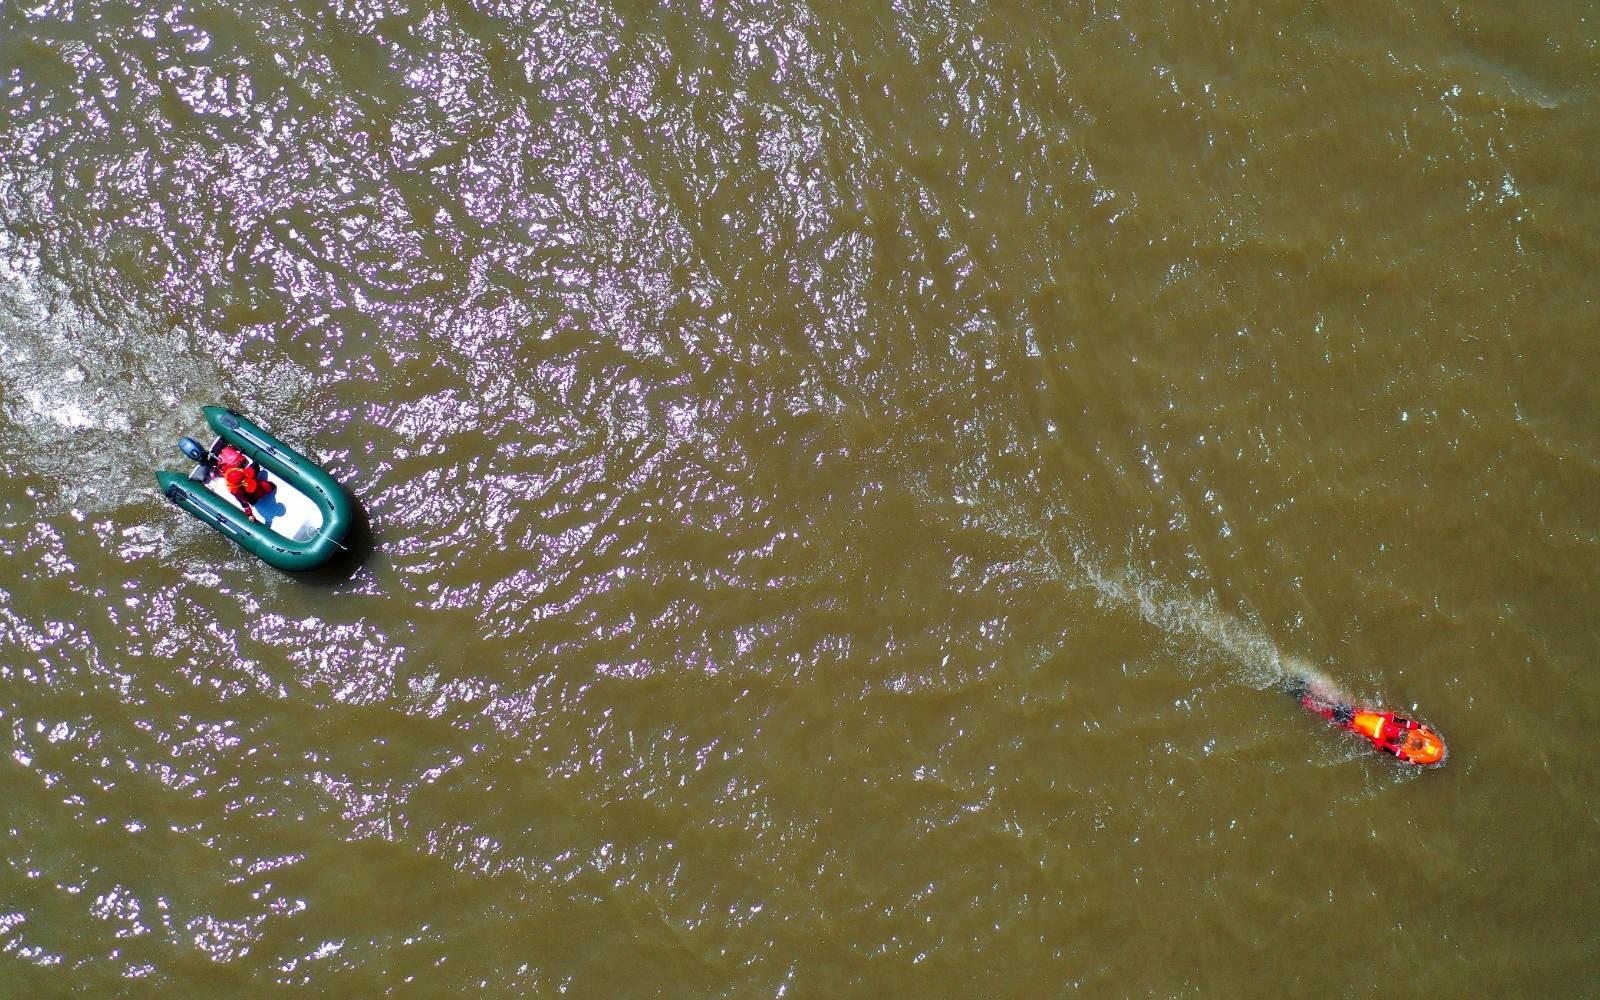 Cutting-edge technologies make flood prevention smarter